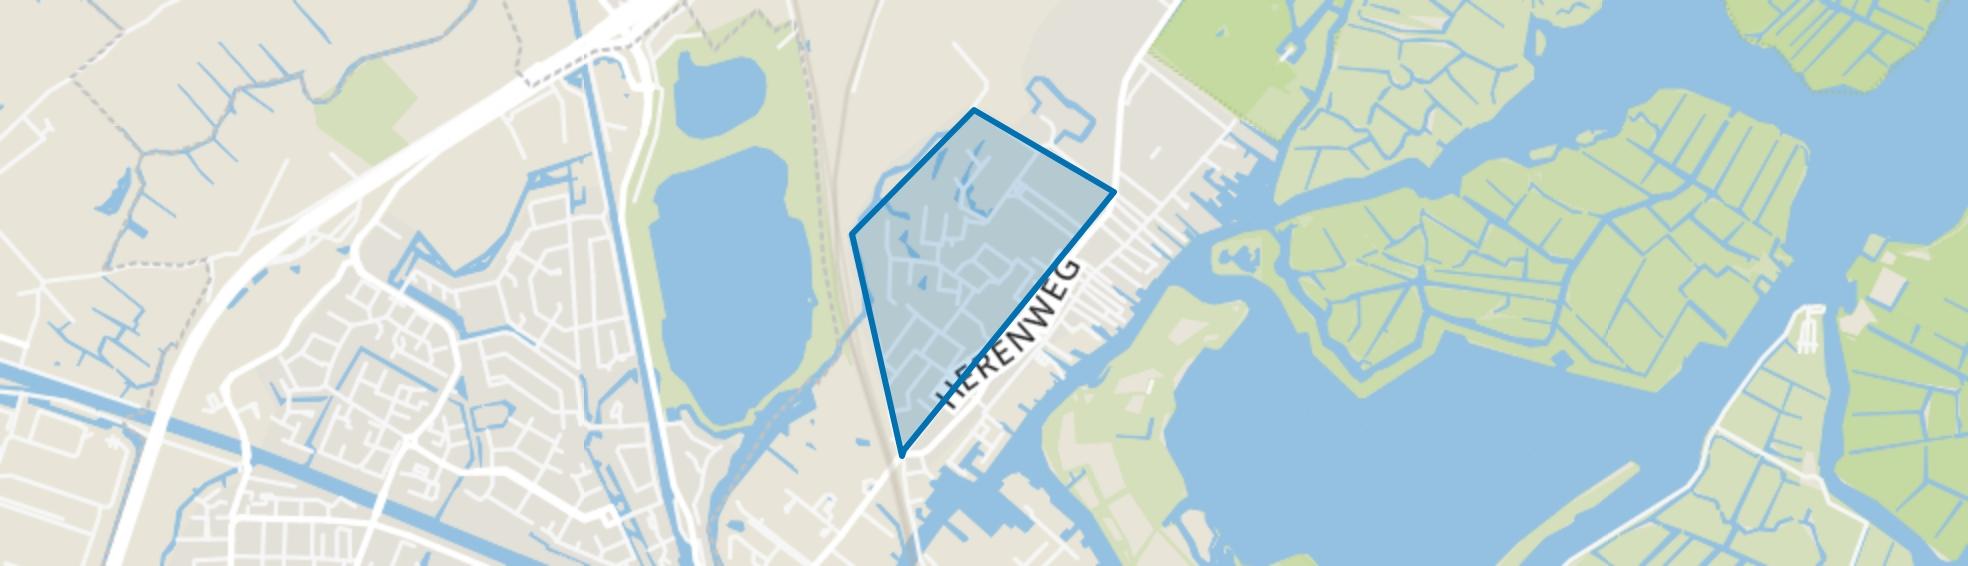 Kloosterland-Endepoel, Warmond map